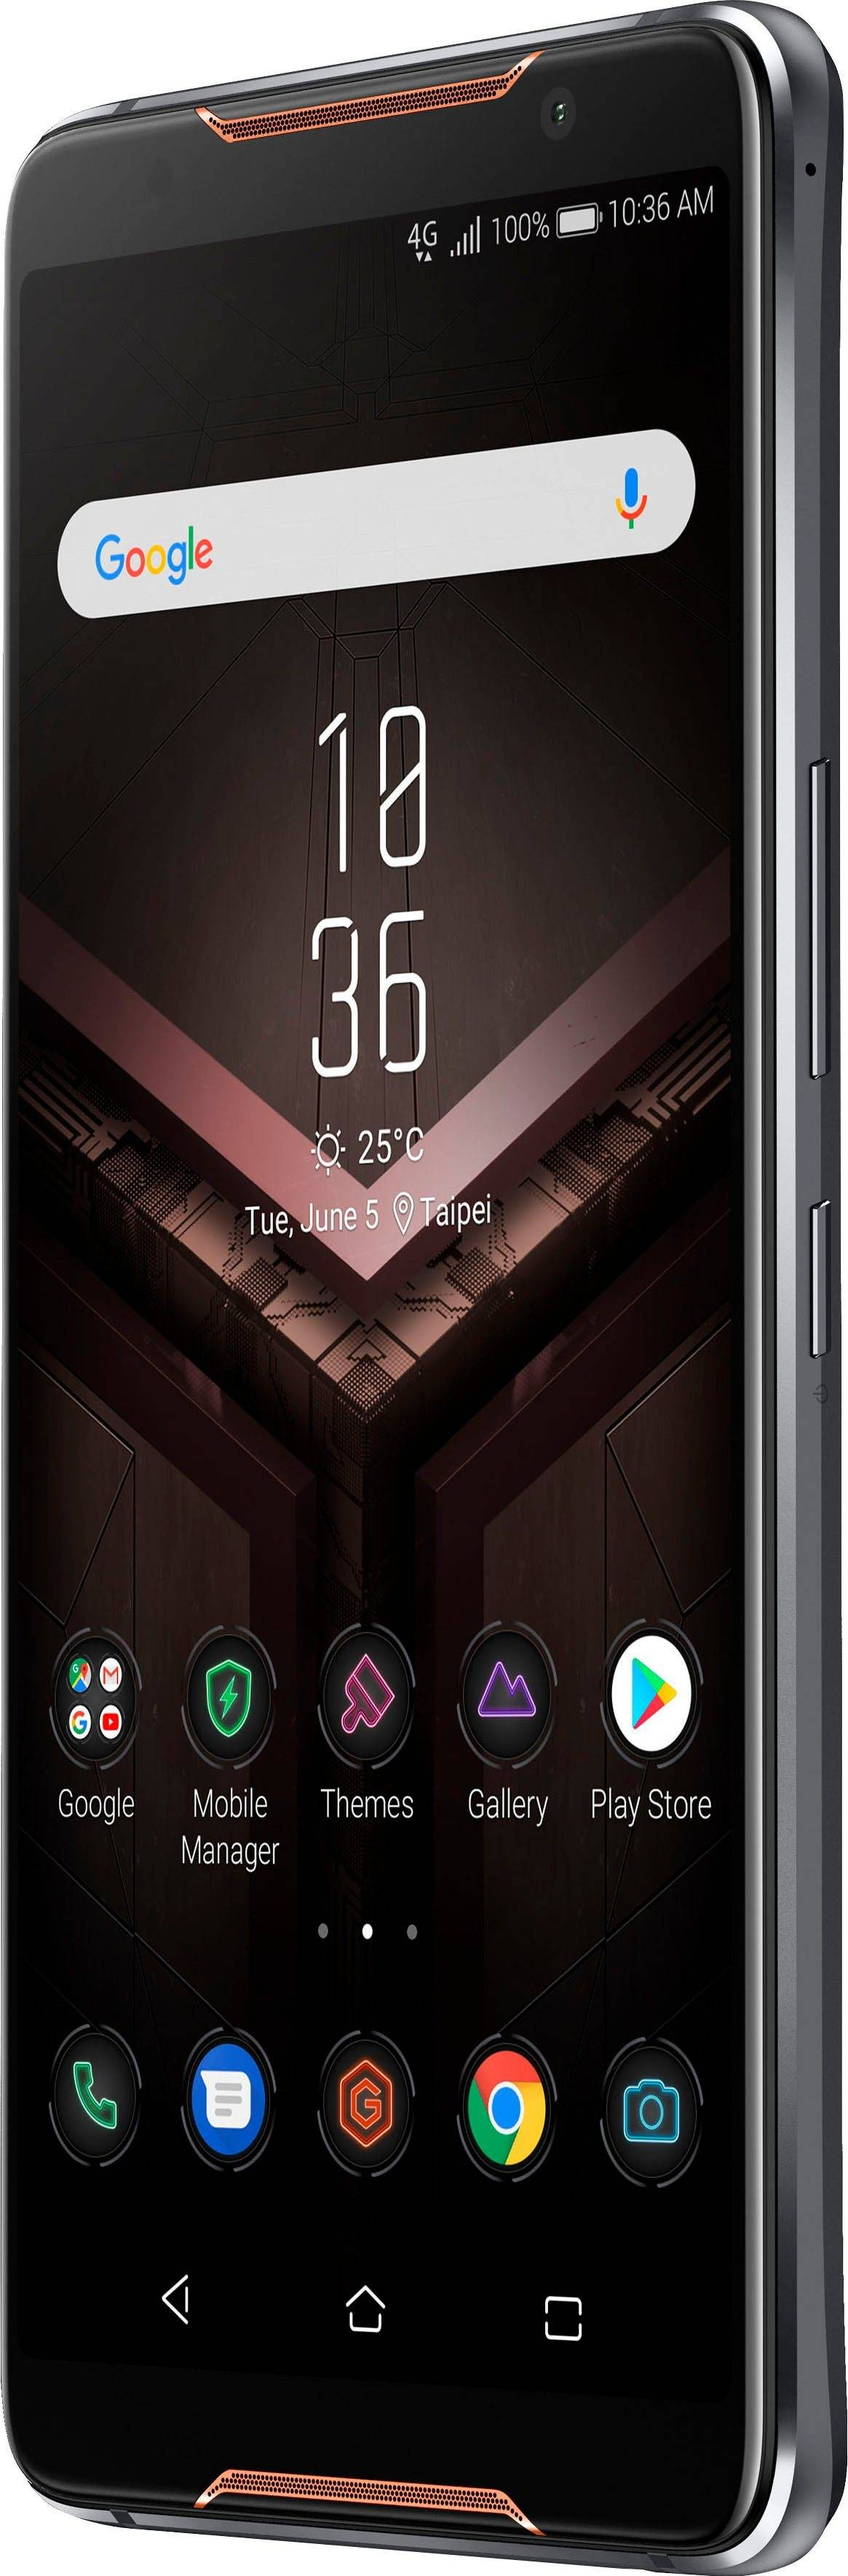 Asus ROG Phone ZS600 KL Smartphone (15,24 cm/6 Zoll, 512 GB Speicherplatz, 12 MP Kamera)